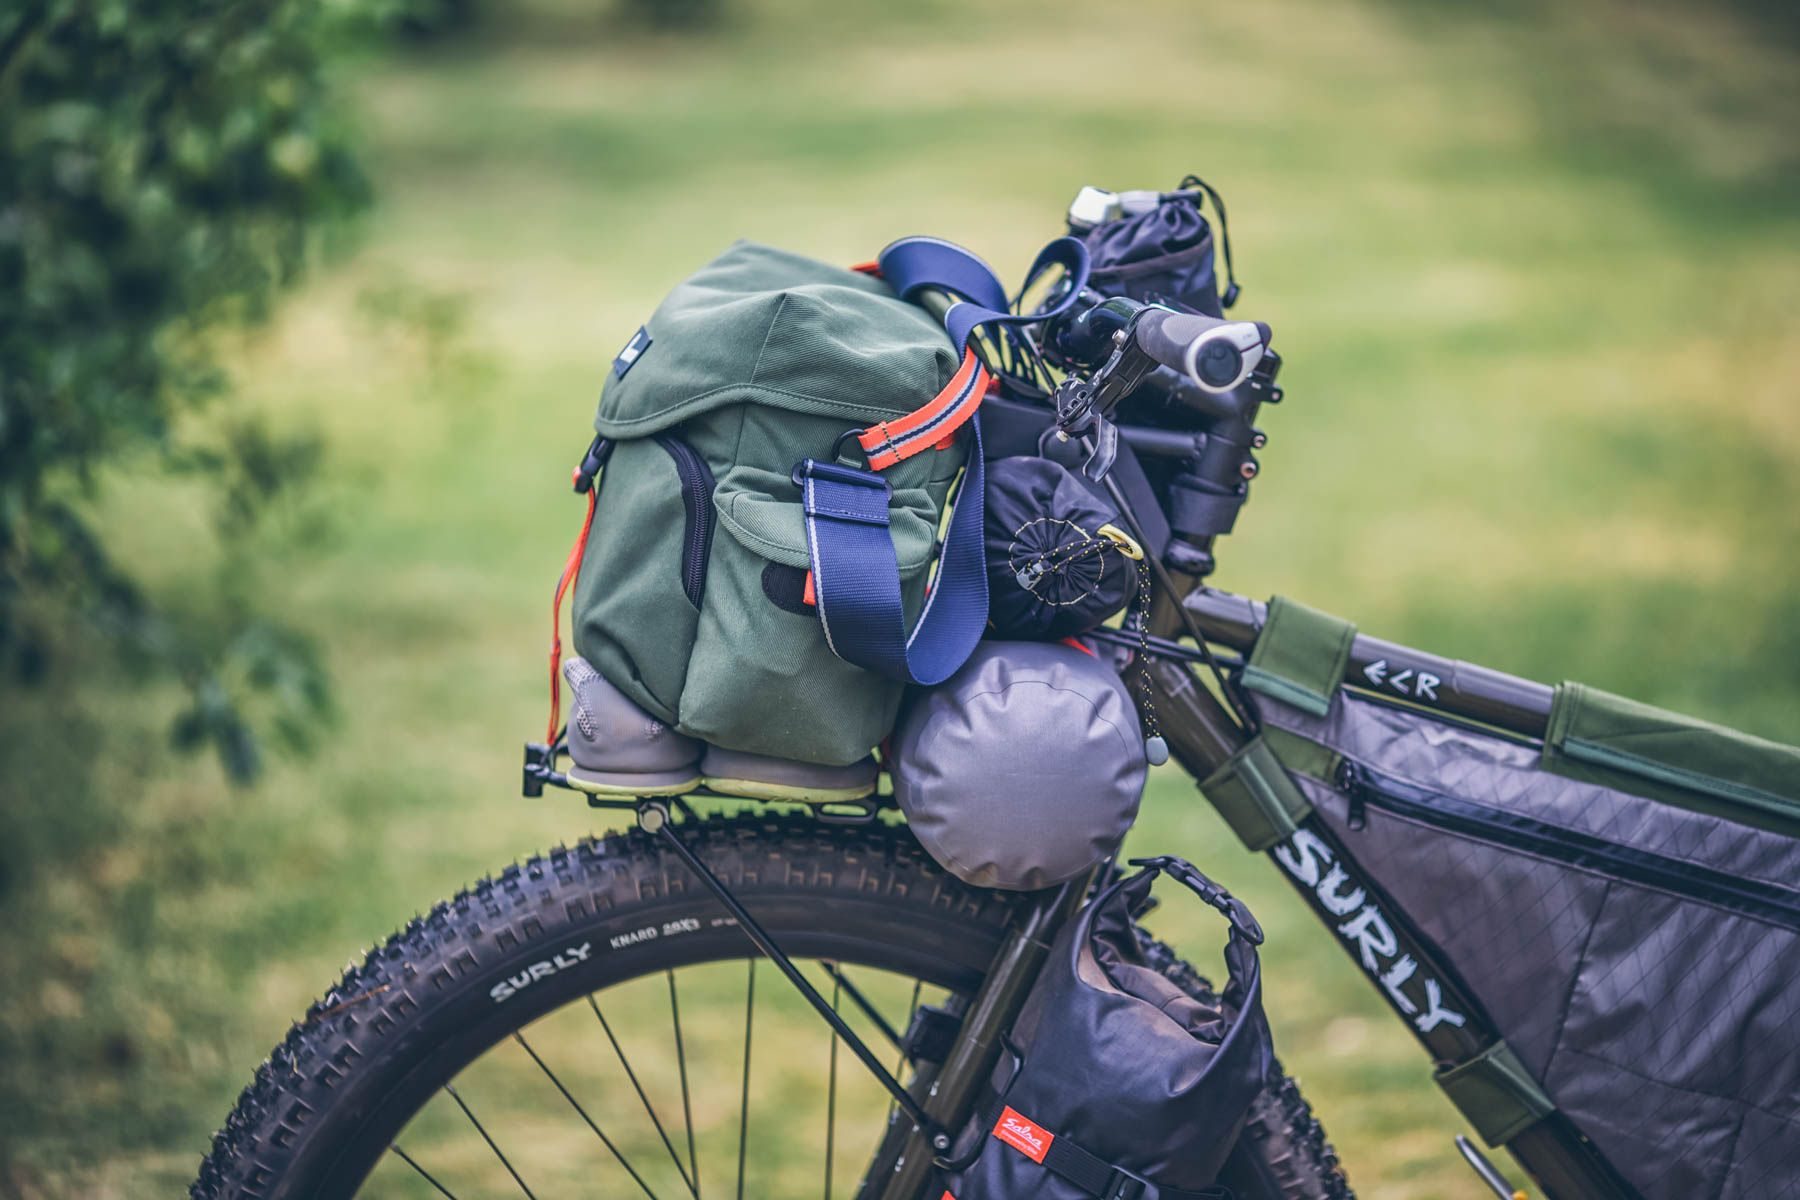 The Perfect Camera Handlebar Bag For An Adventure Photographer Bike Touring Crumpler Kashgar Outpost